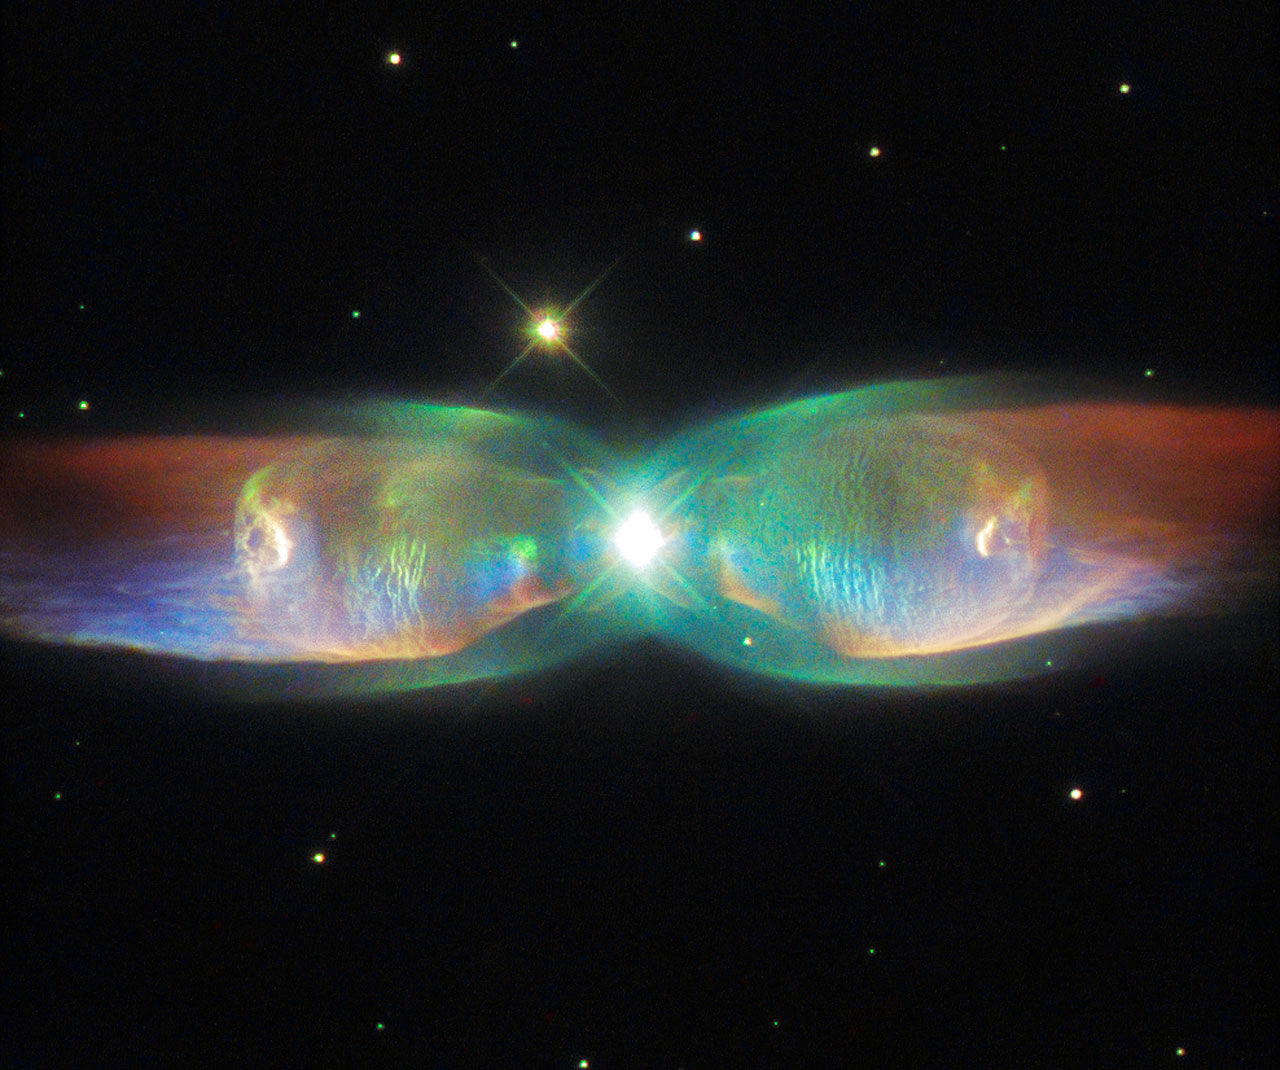 Stelle Galassie Nebulose Buchi neri - Pagina 9 Heic1518a_1280